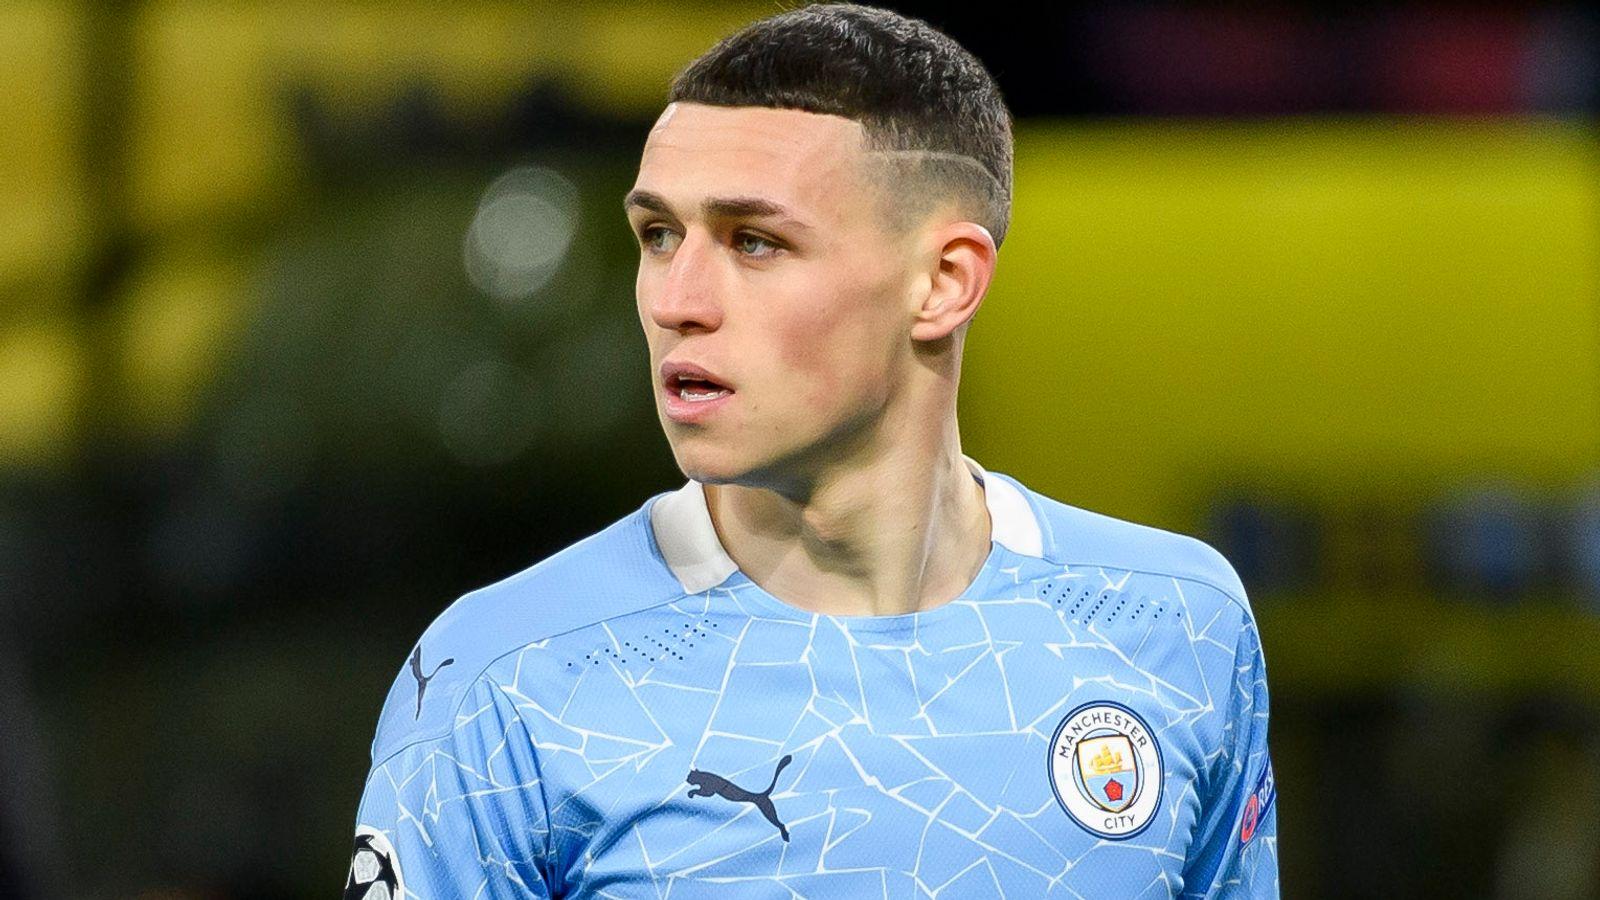 Man City hopeful on Foden starting season – sources